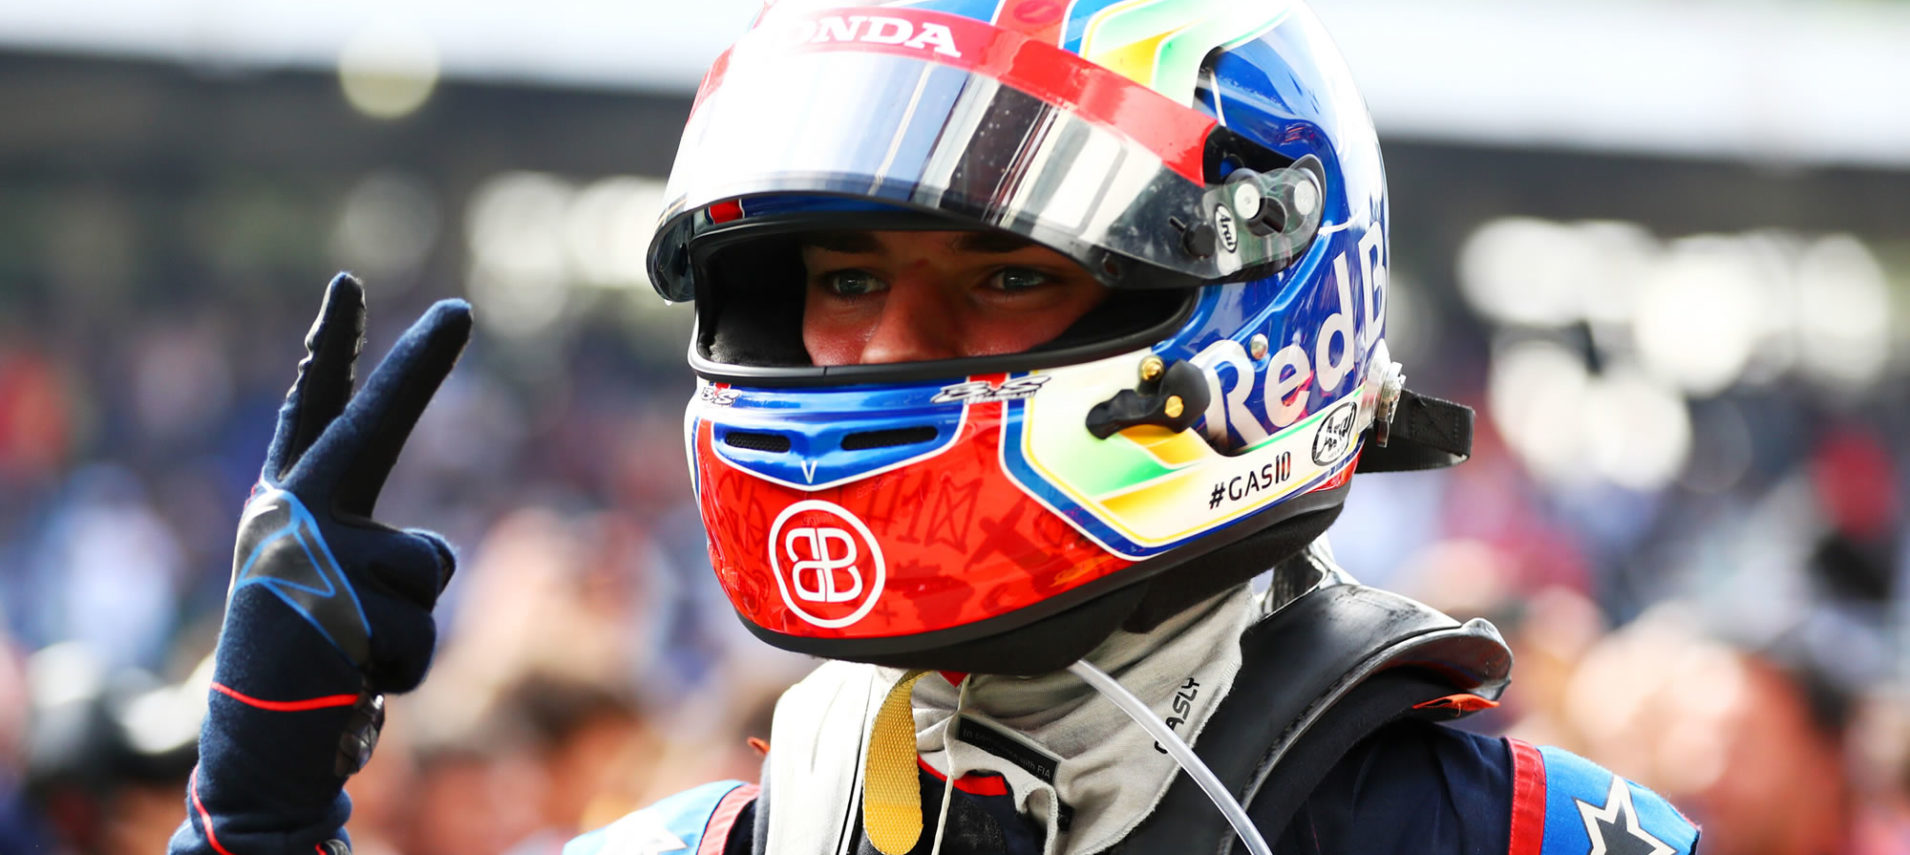 Brazil GP 2019 – Podium! 2